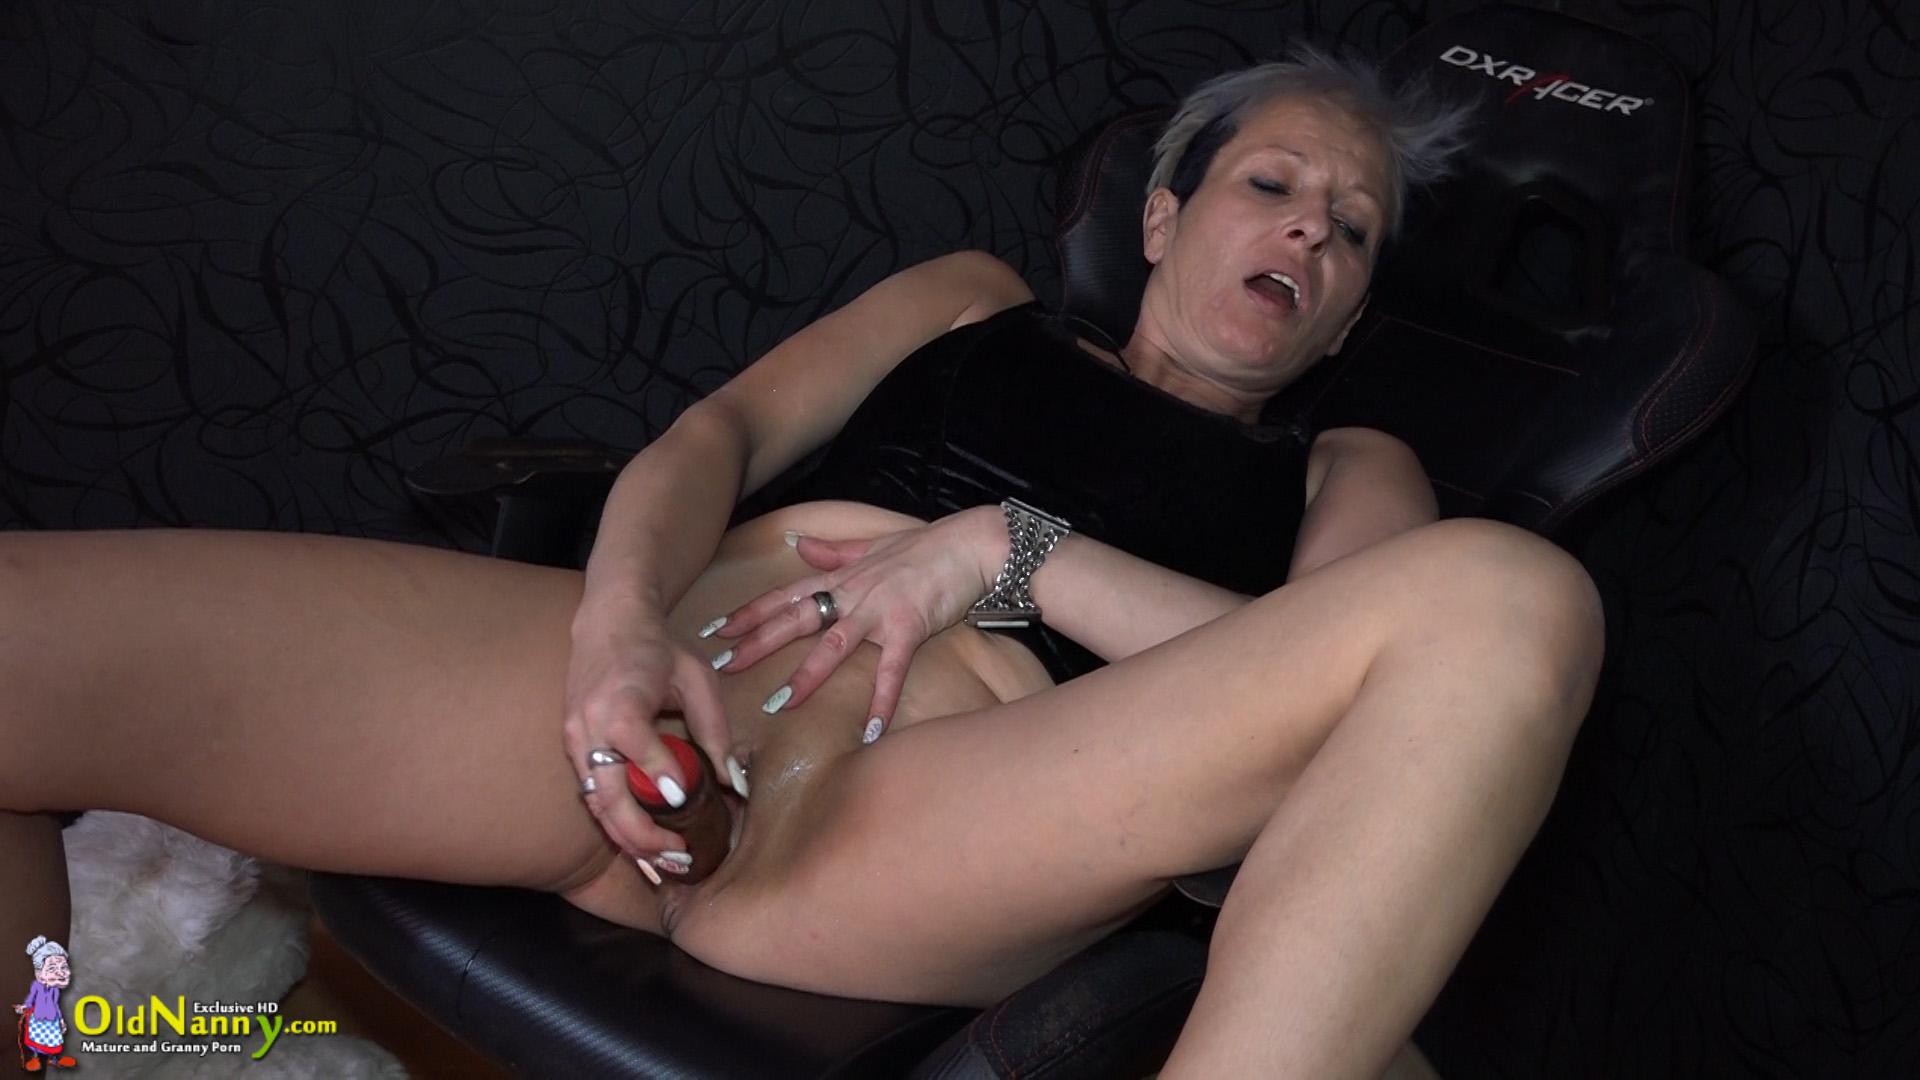 онлайн старая мастурбация копилка - 3